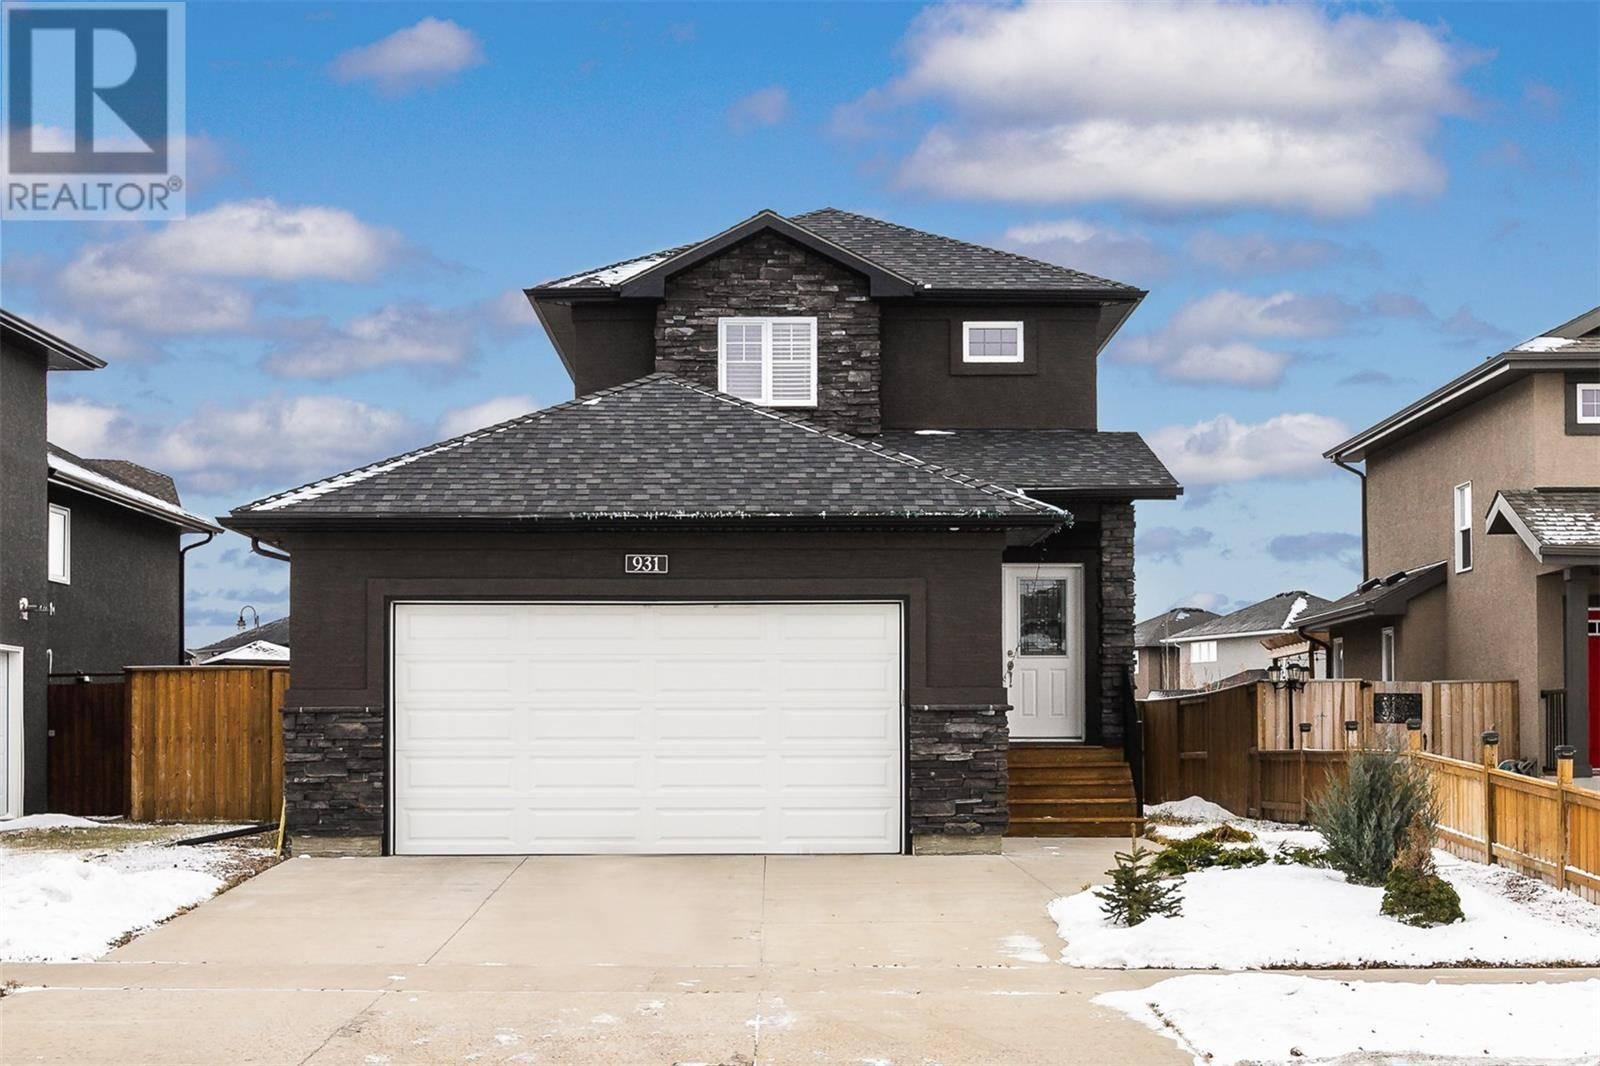 House for sale at 931 Hunter Rd Saskatoon Saskatchewan - MLS: SK791295